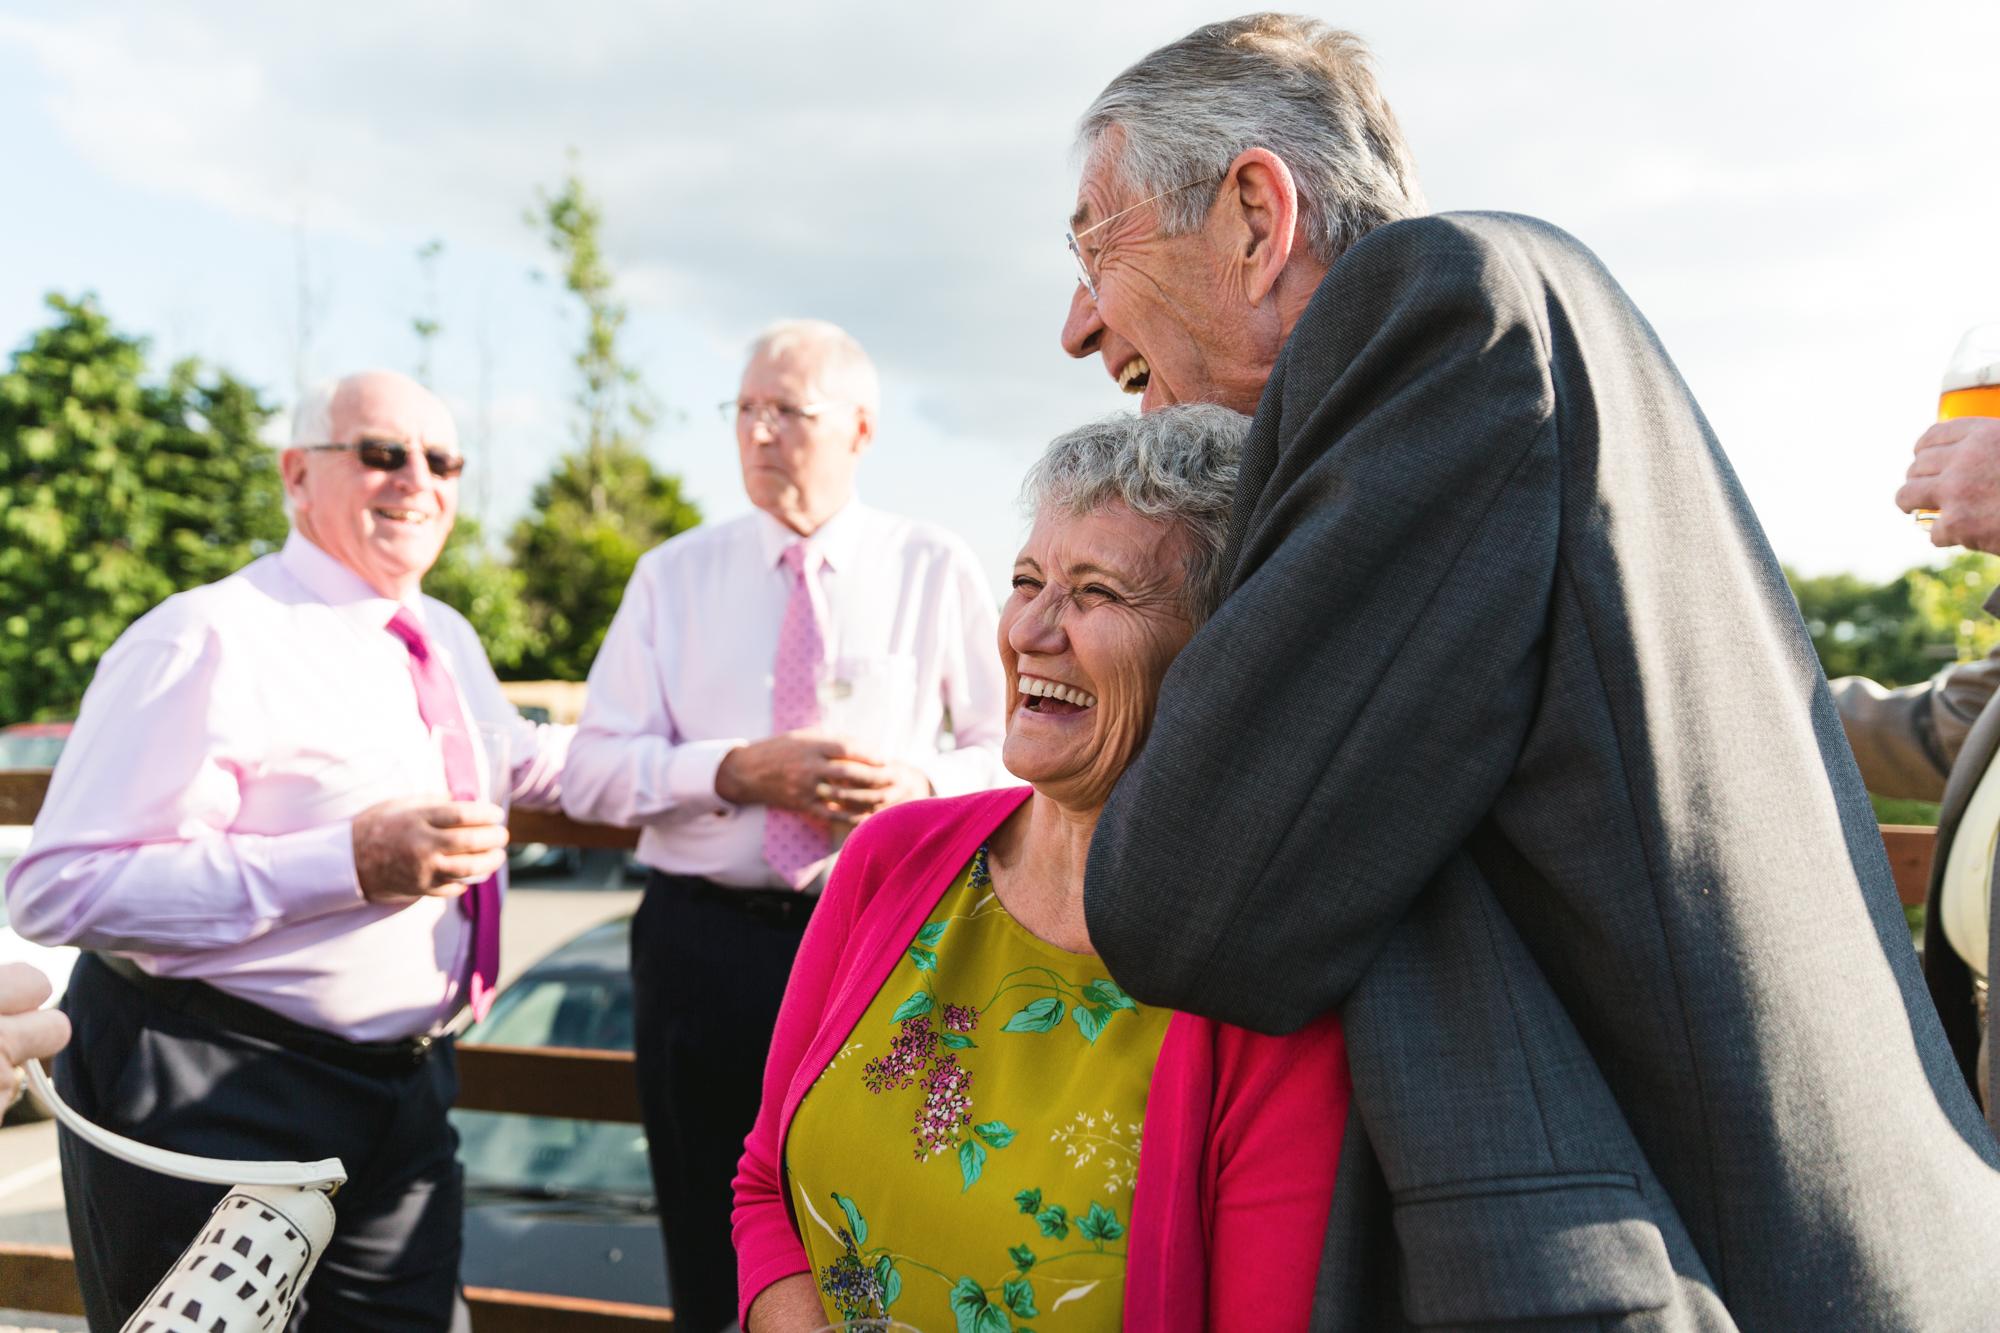 wedding guests at Ridgeway golf club thornhill, caerphilly mountain